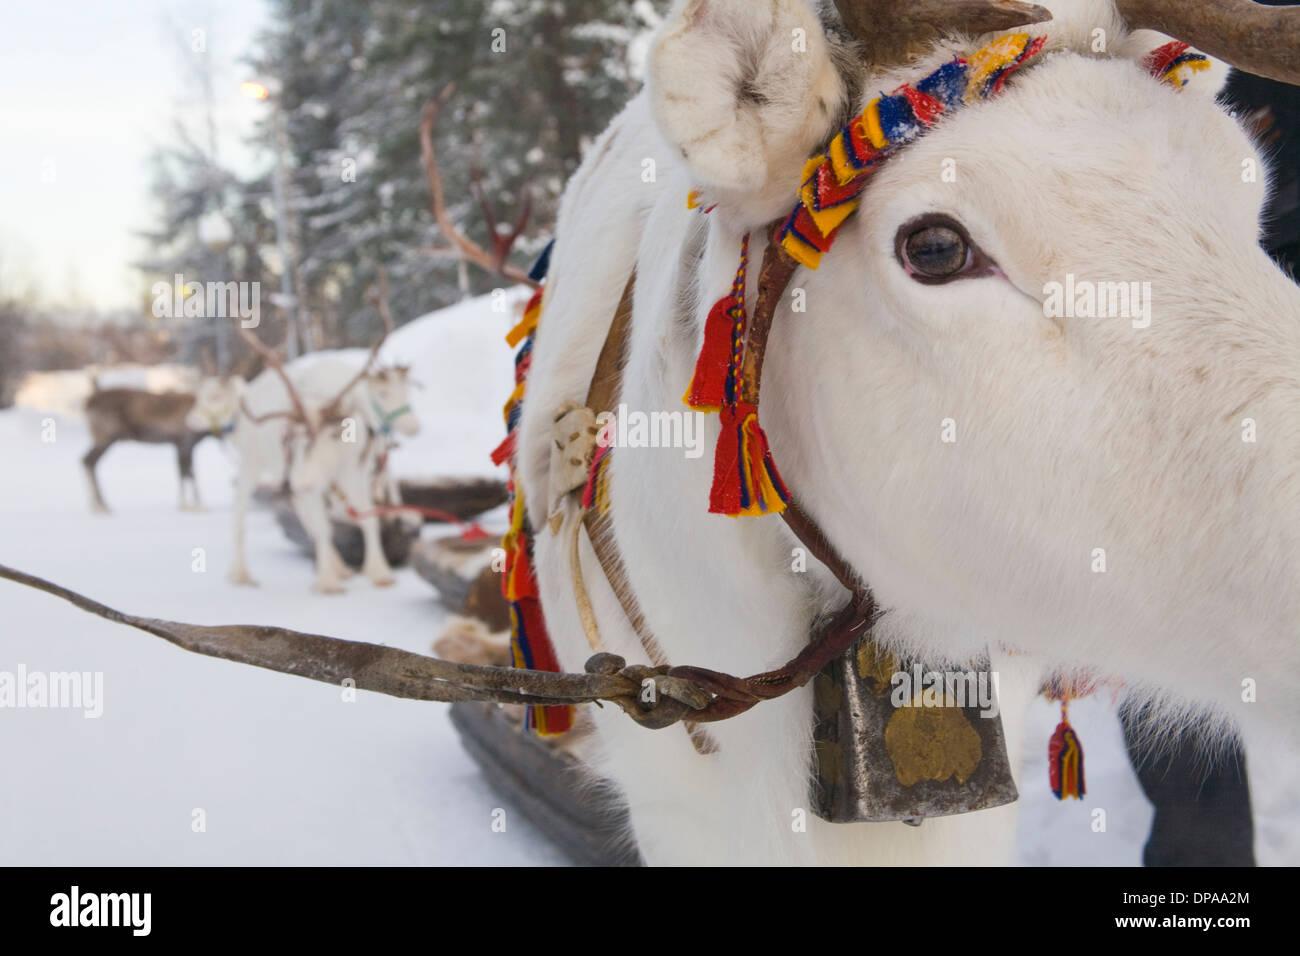 Reindeer caravan Rangifer tarandus Laplander culture Handicraft Decoration Jokkmokk Laponia Sweden - Stock Image